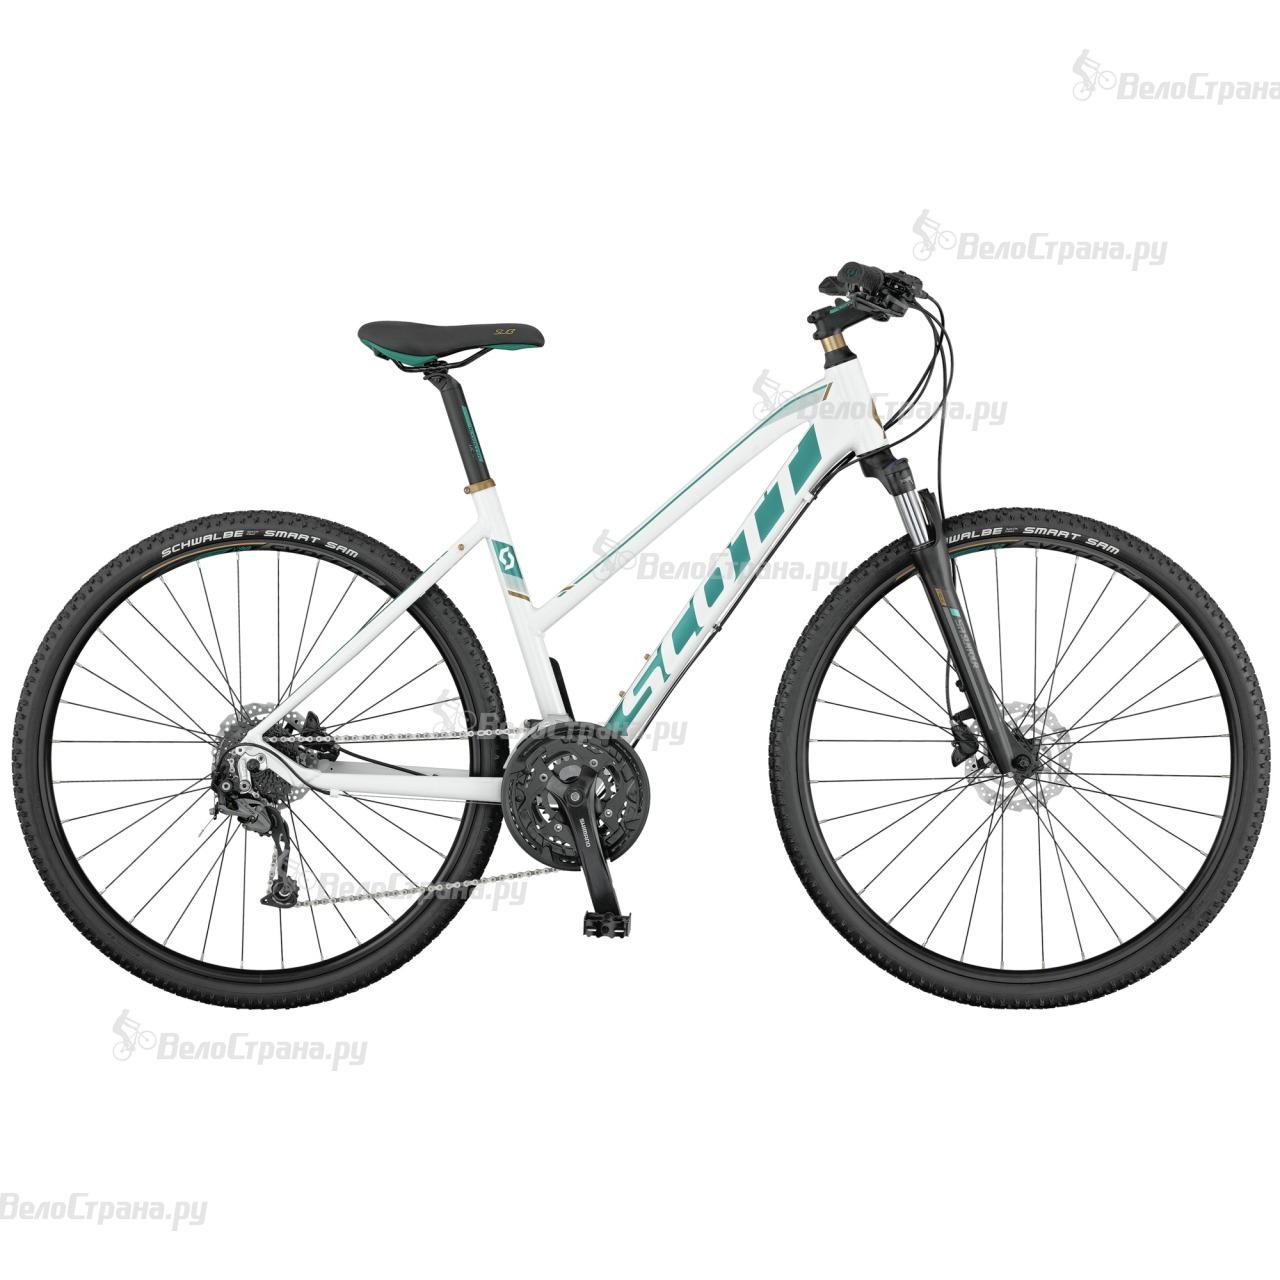 Велосипед Scott Sub Cross 30 Lady (2017) велосипед scott sub cross 30 men 2017